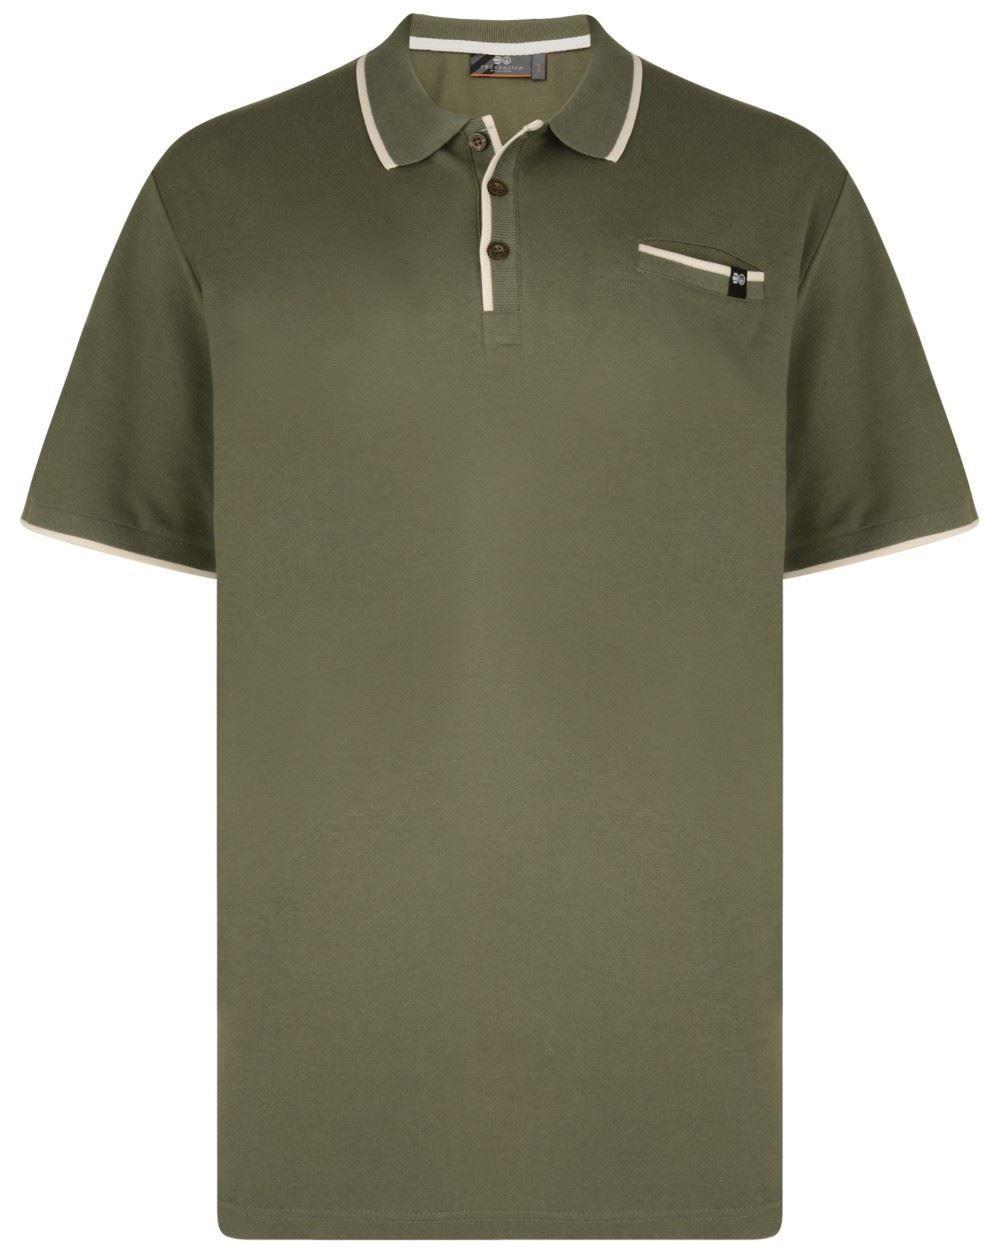 Crosshatch Resernate Polo Shirt - Khaki|5XL